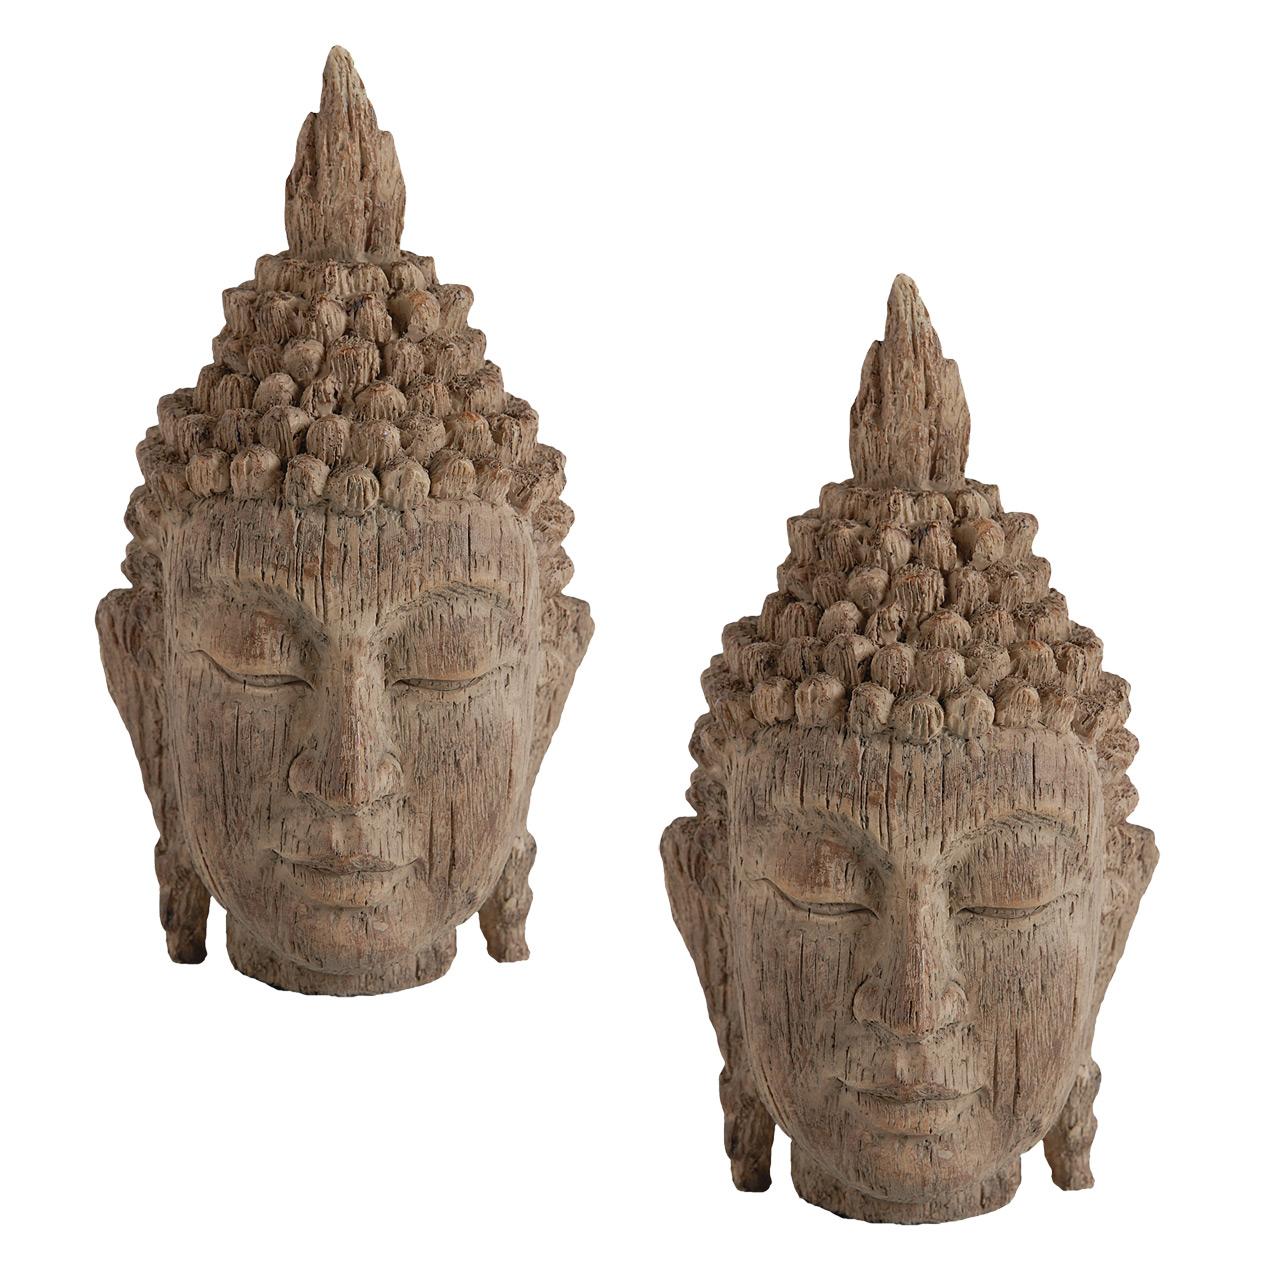 {} ARTEVALUCE Статуэтка Голова Будды (11х12х20 см - 2 шт) статуэтка африканка федерация статуэтка африканка